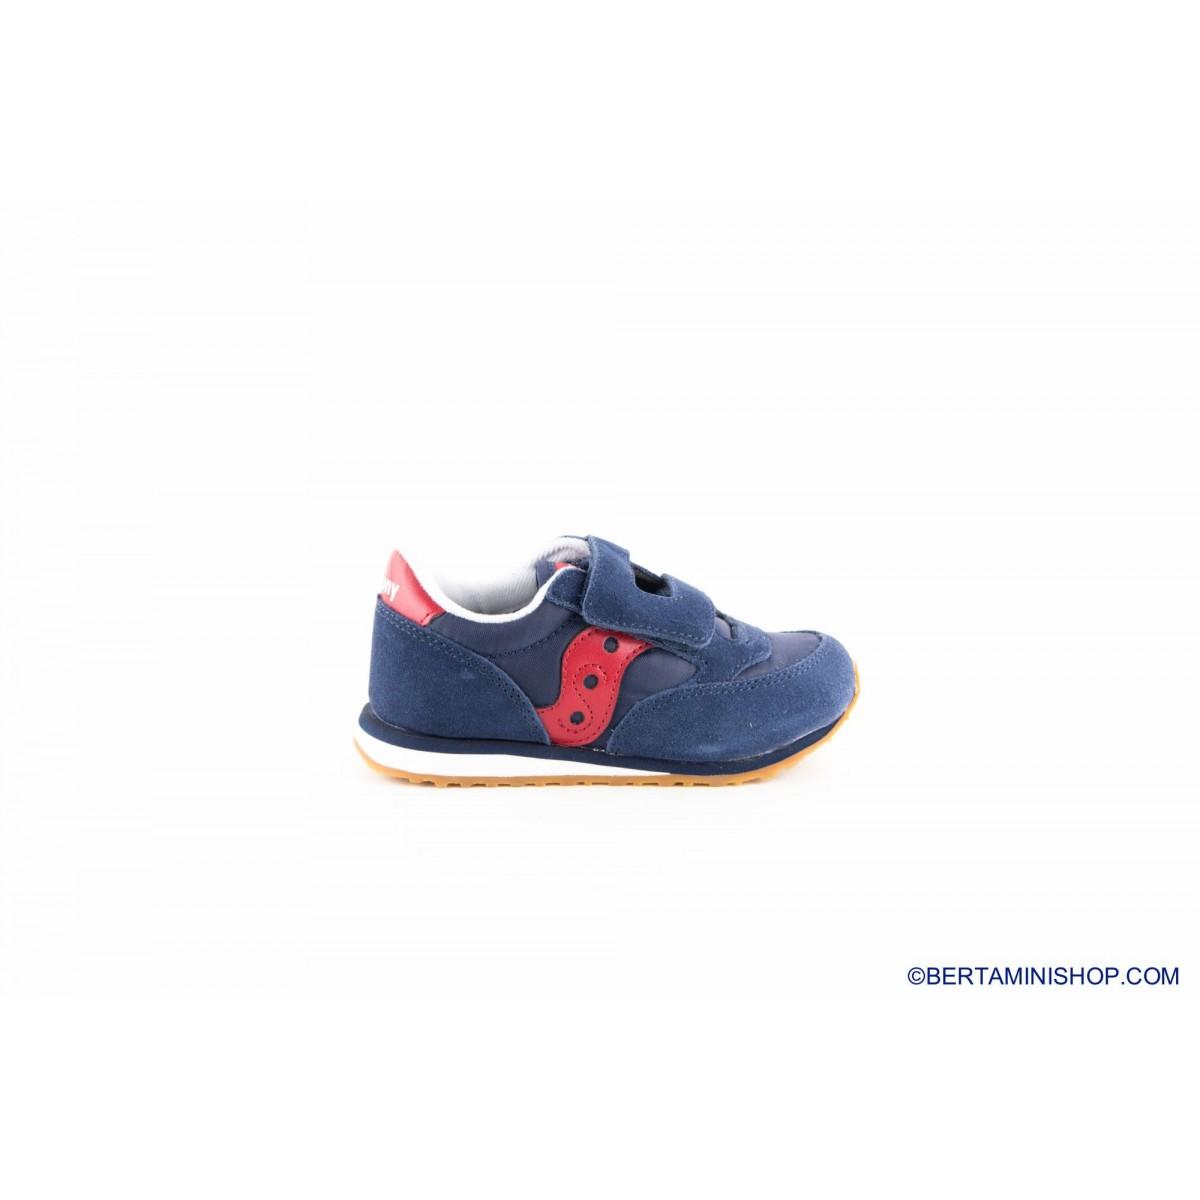 Schuhe Saucony Kind - ST53512